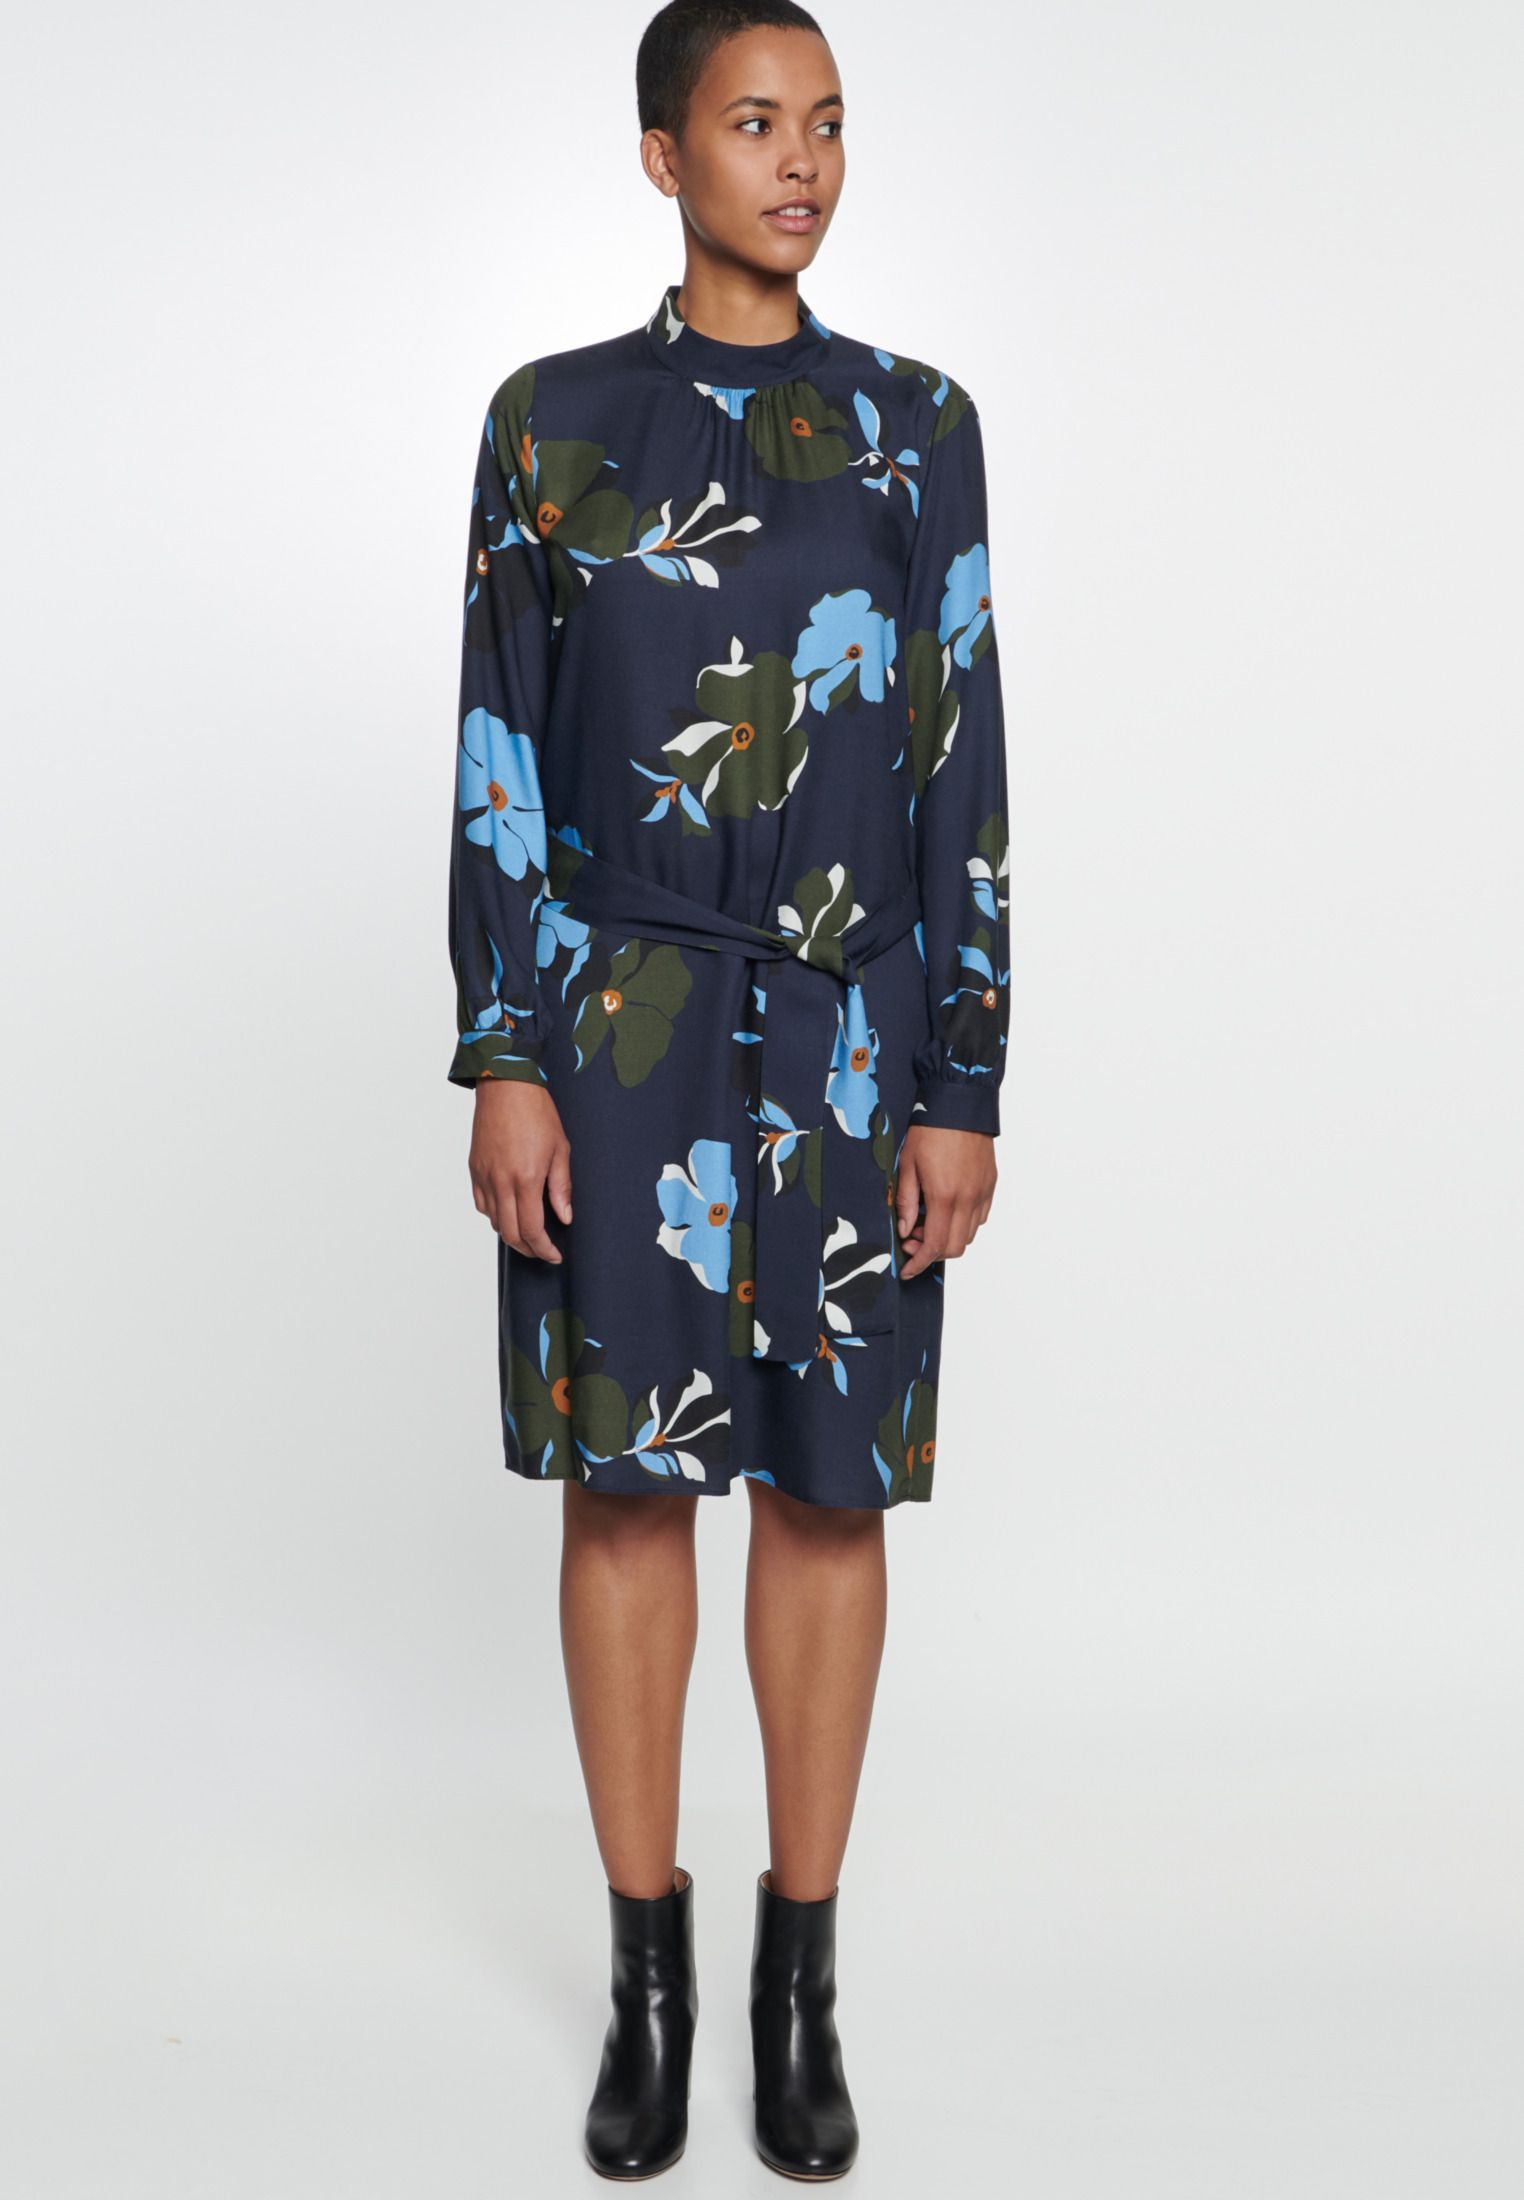 Damen Twill Midi Kleid aus 18% Viskose dunkelblau 18.18-18